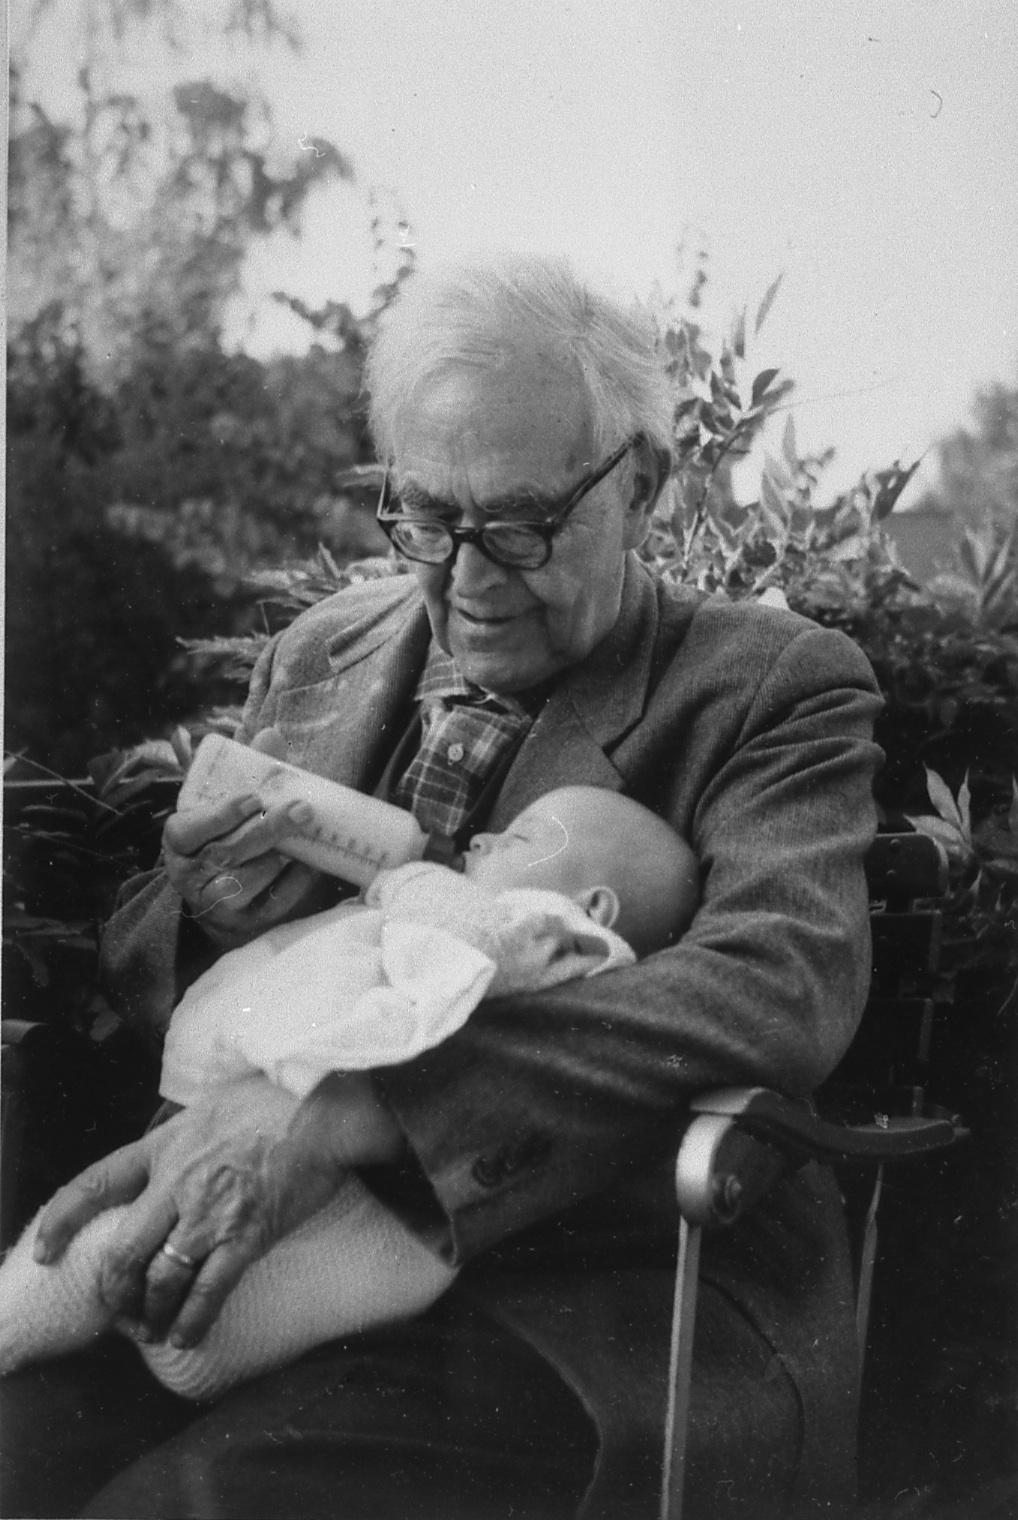 Karl Barth with his first great grandchild, Olivier Schopfer, in 1962.